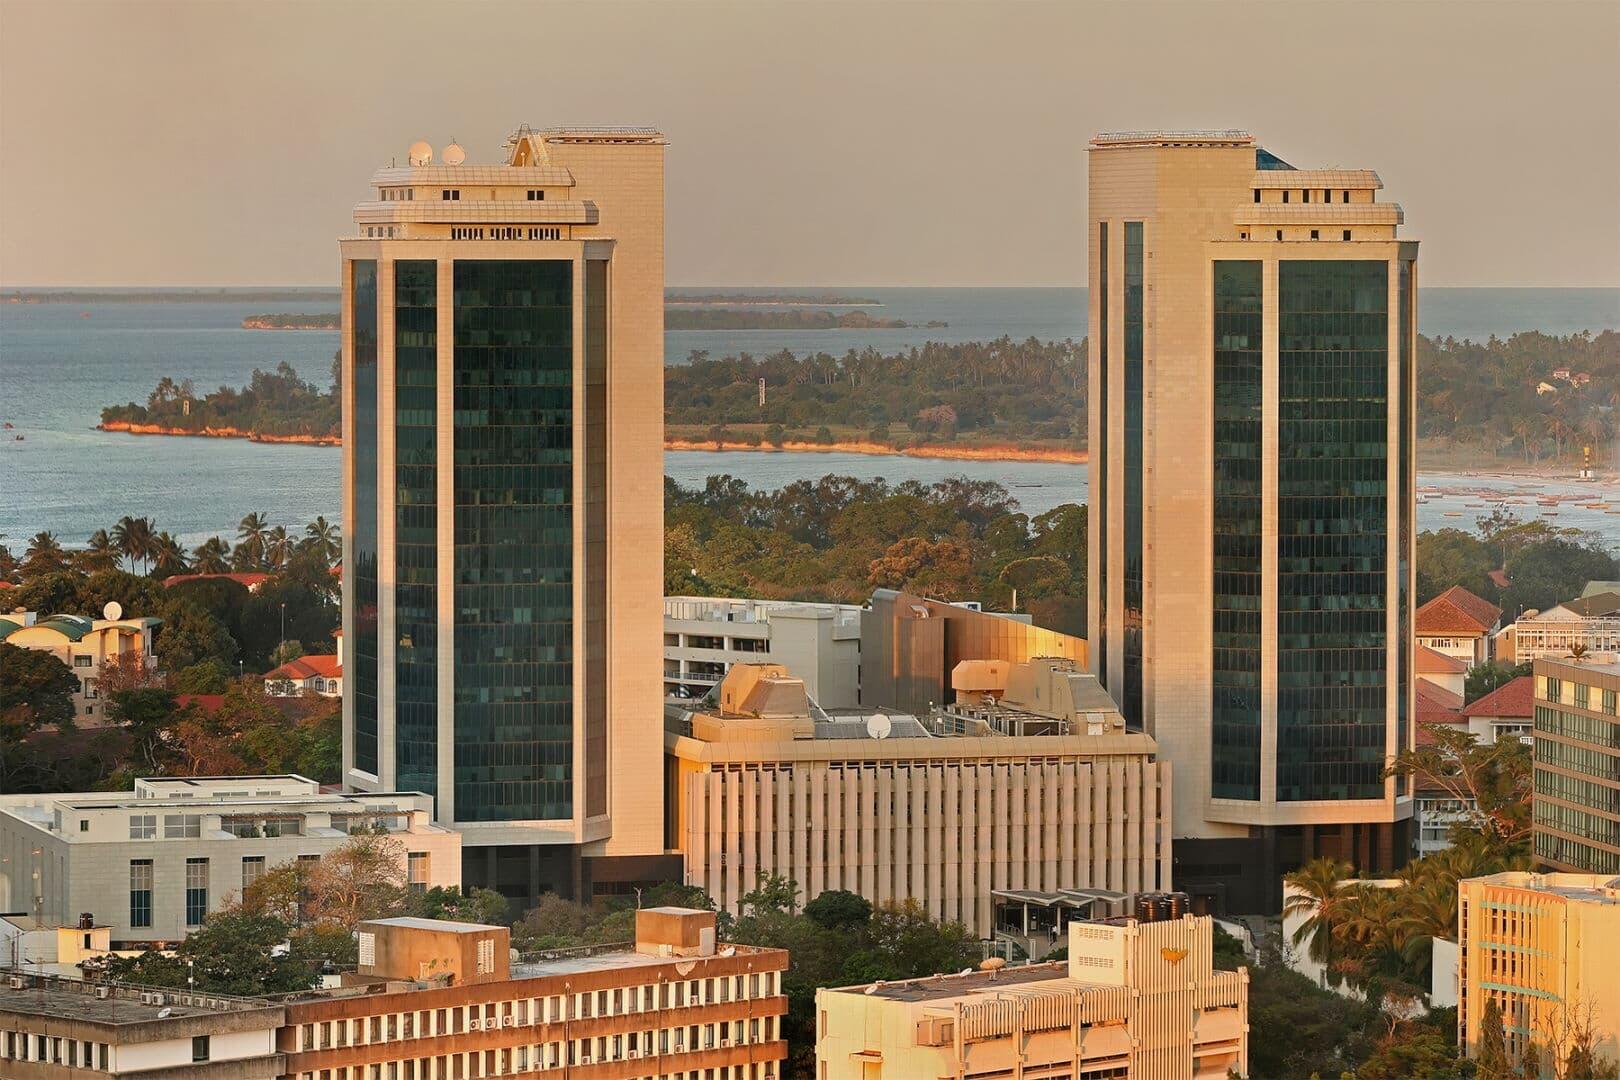 Dar es Salaam photo